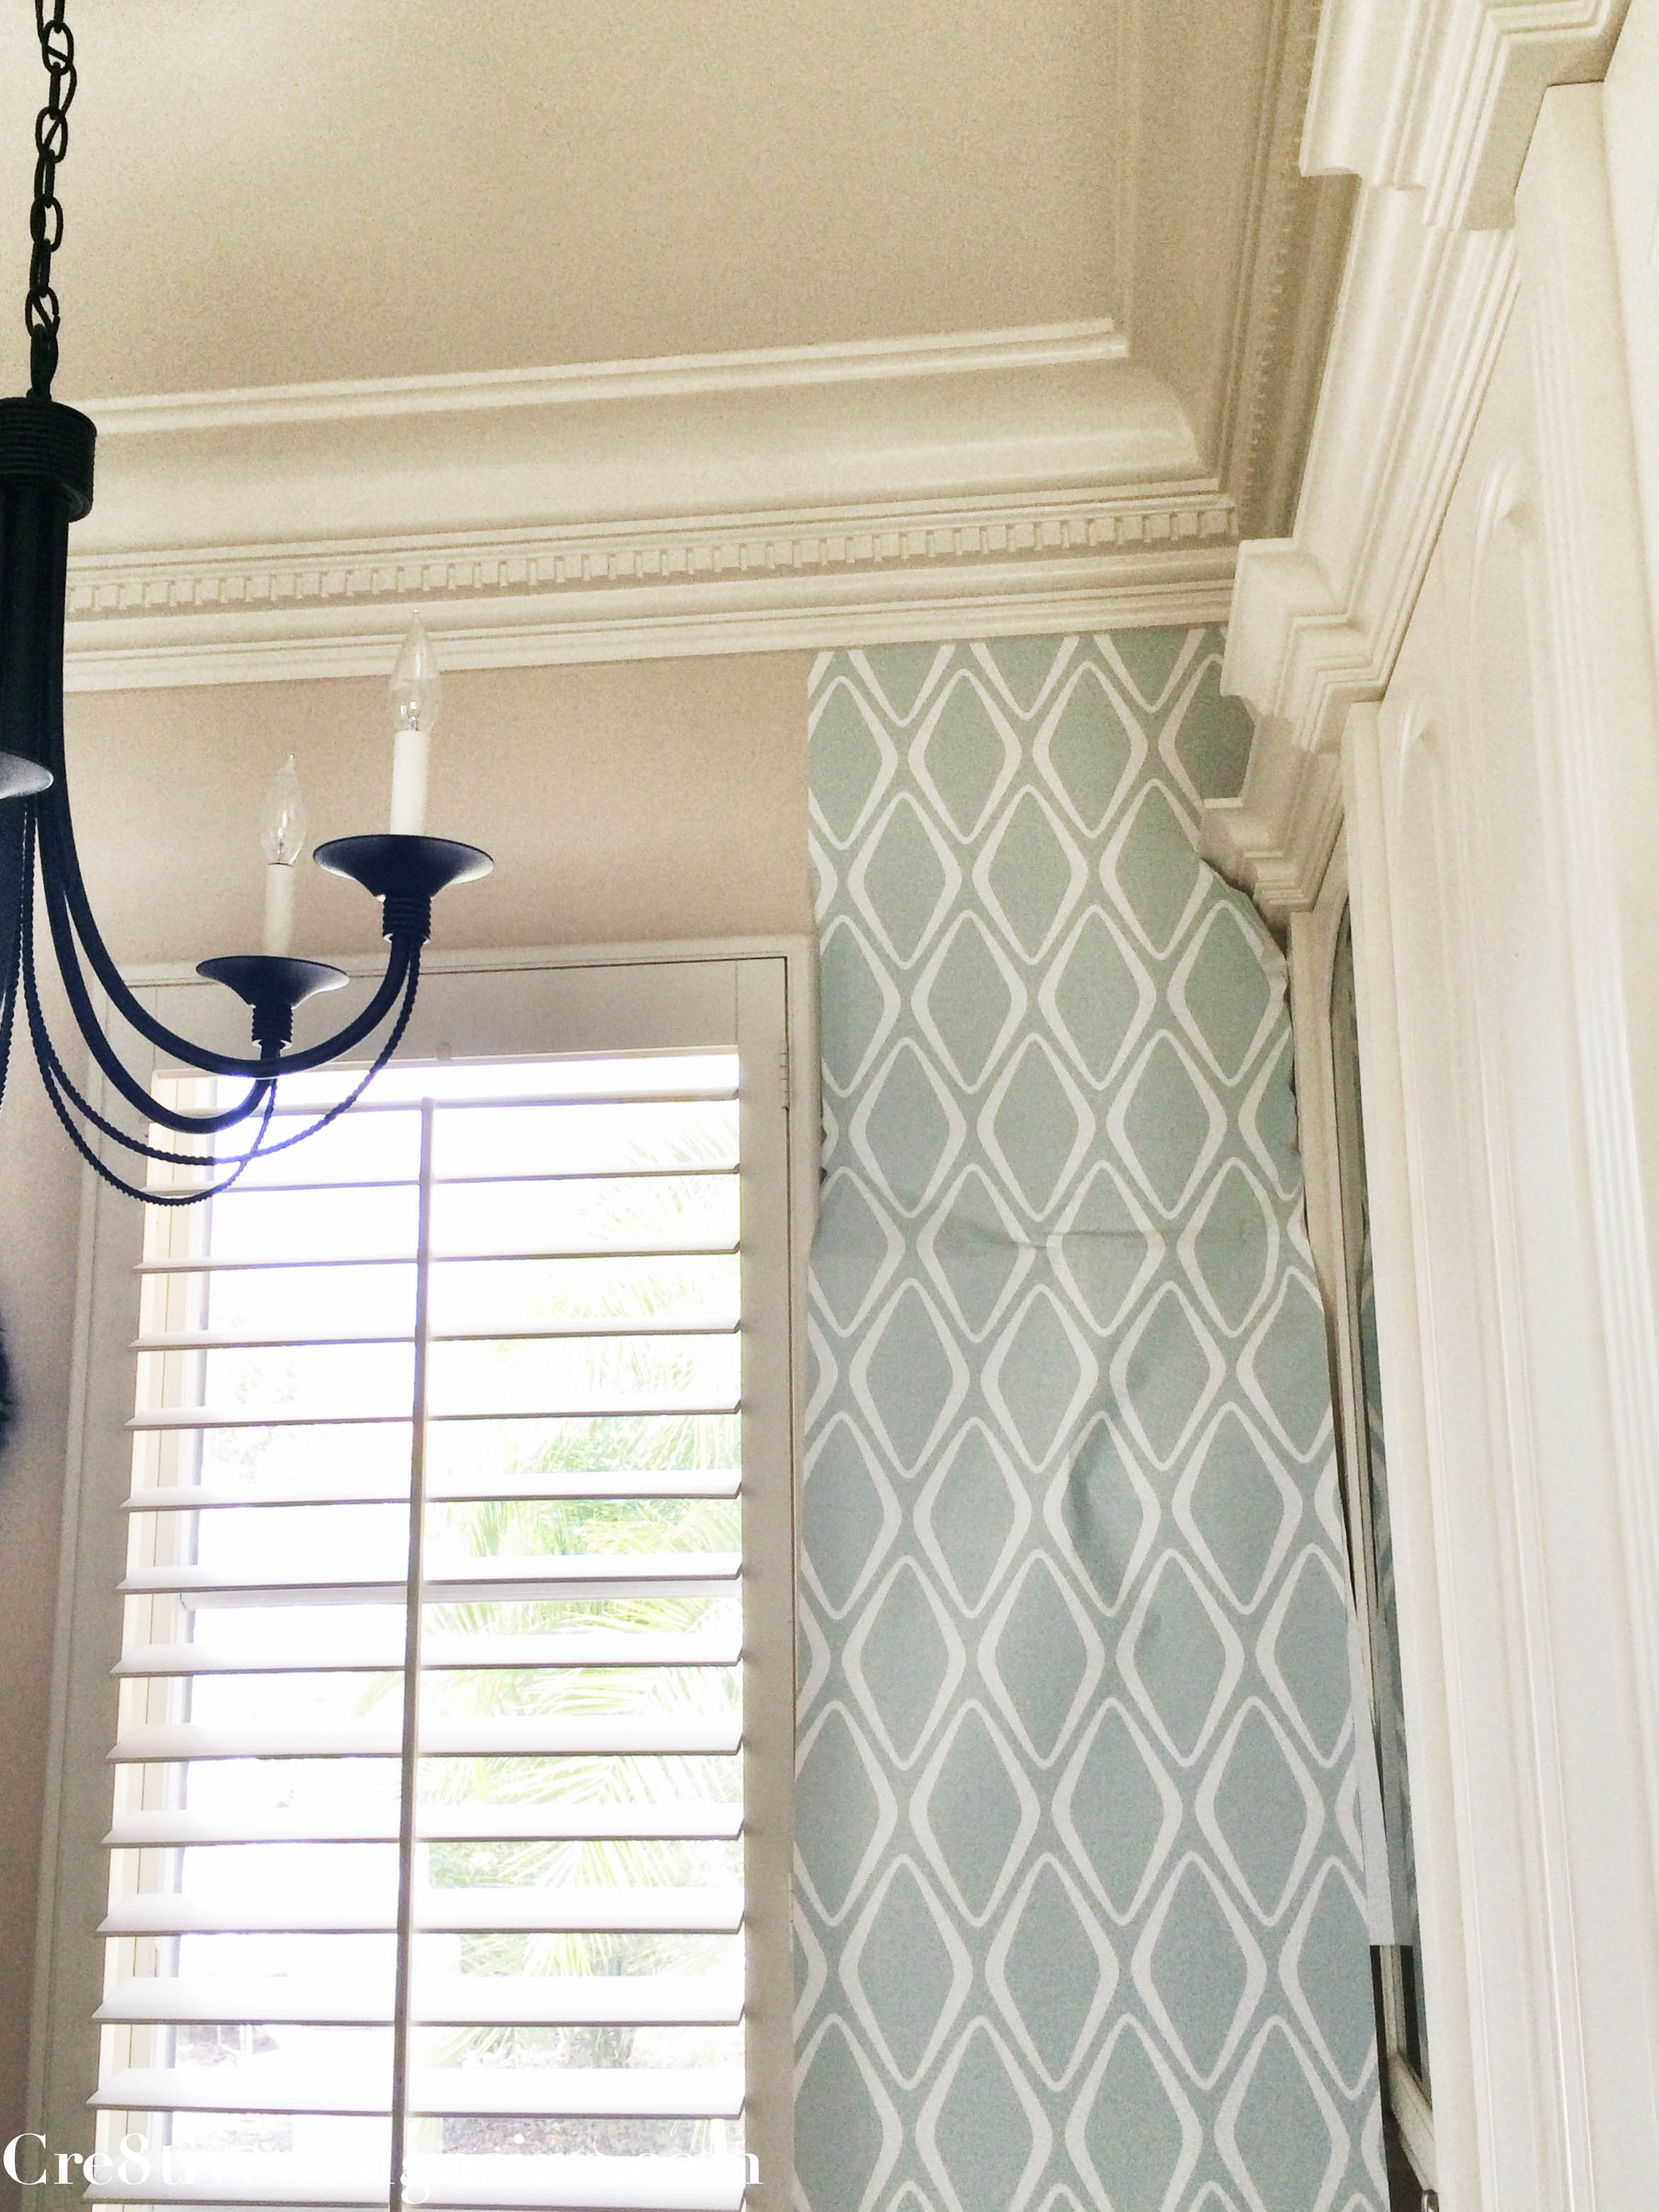 removable wallpaper - cre8tive designs inc.